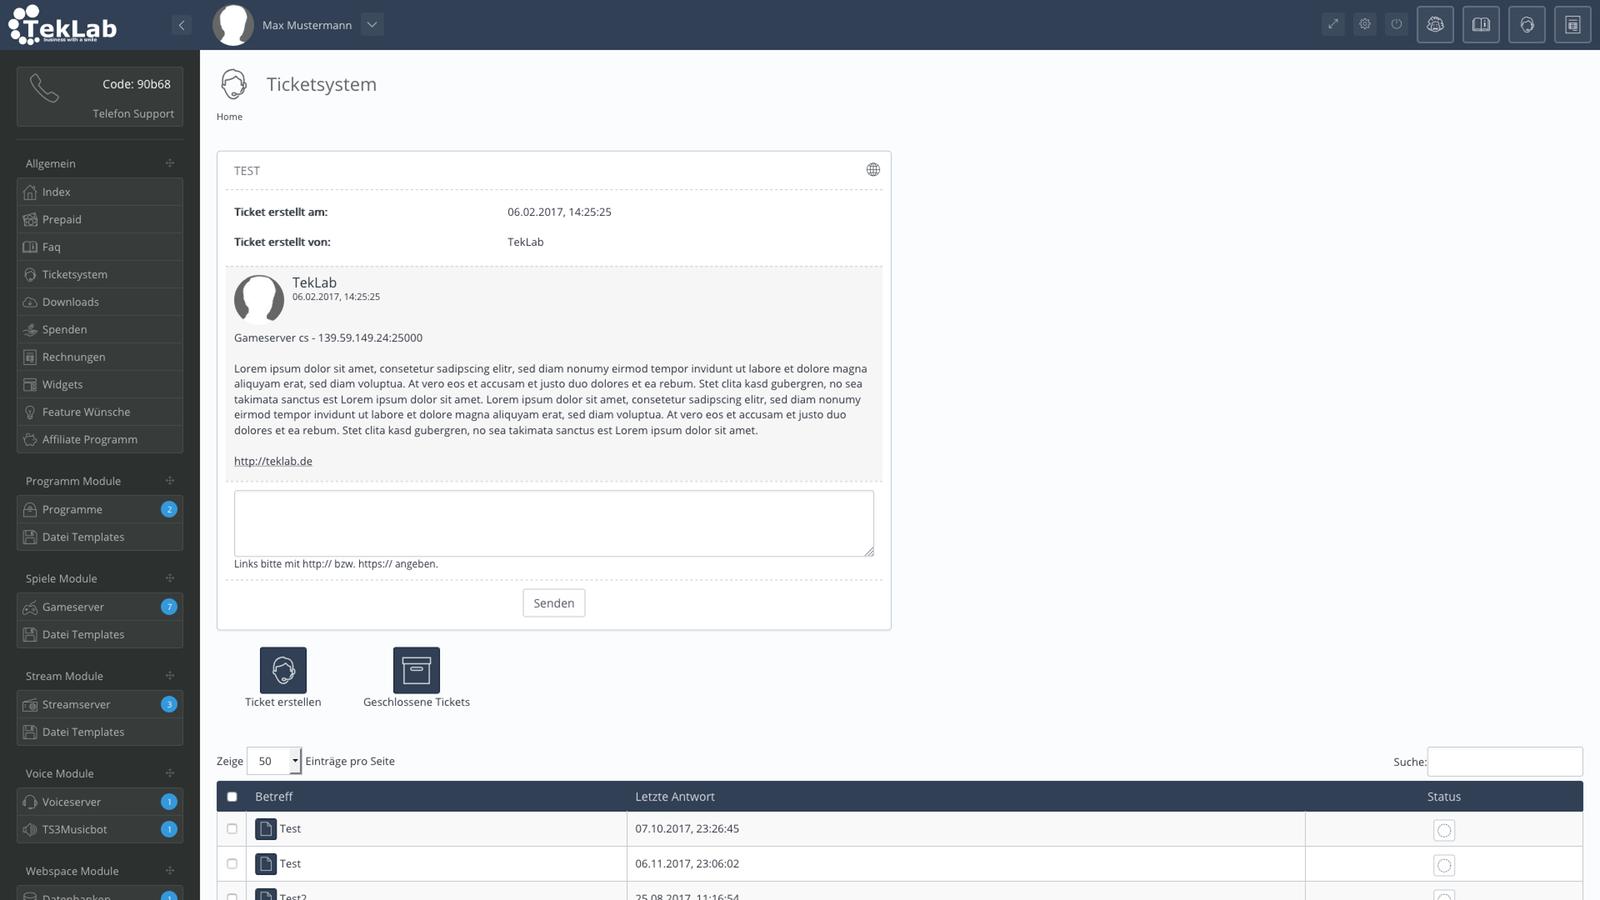 TekBASE Kundenbereich - Ticketsystem